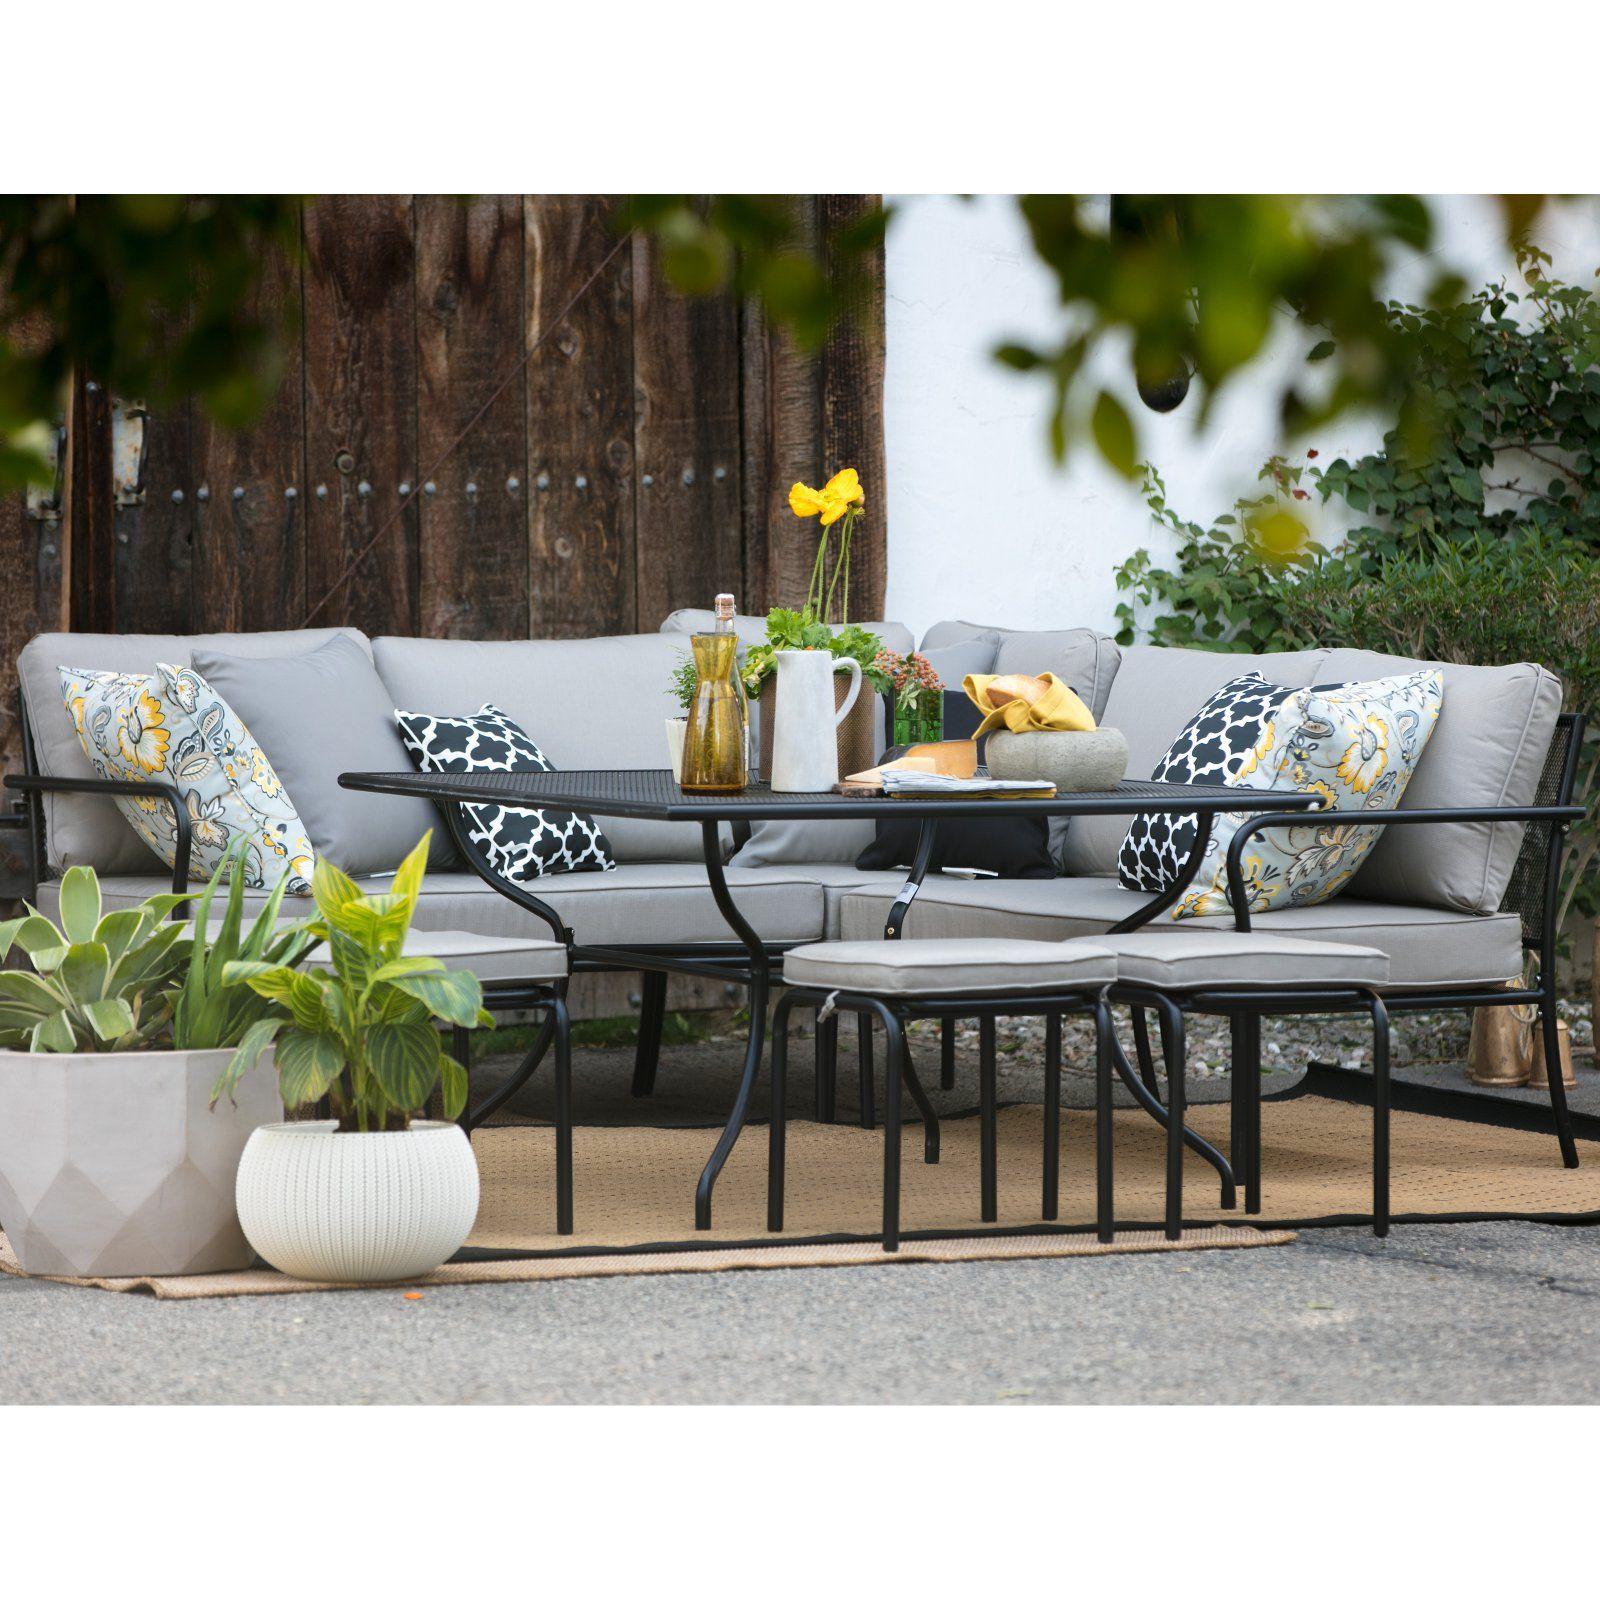 Outdoor Belham Living Parkville Metal Sofa Sectional Patio Dining